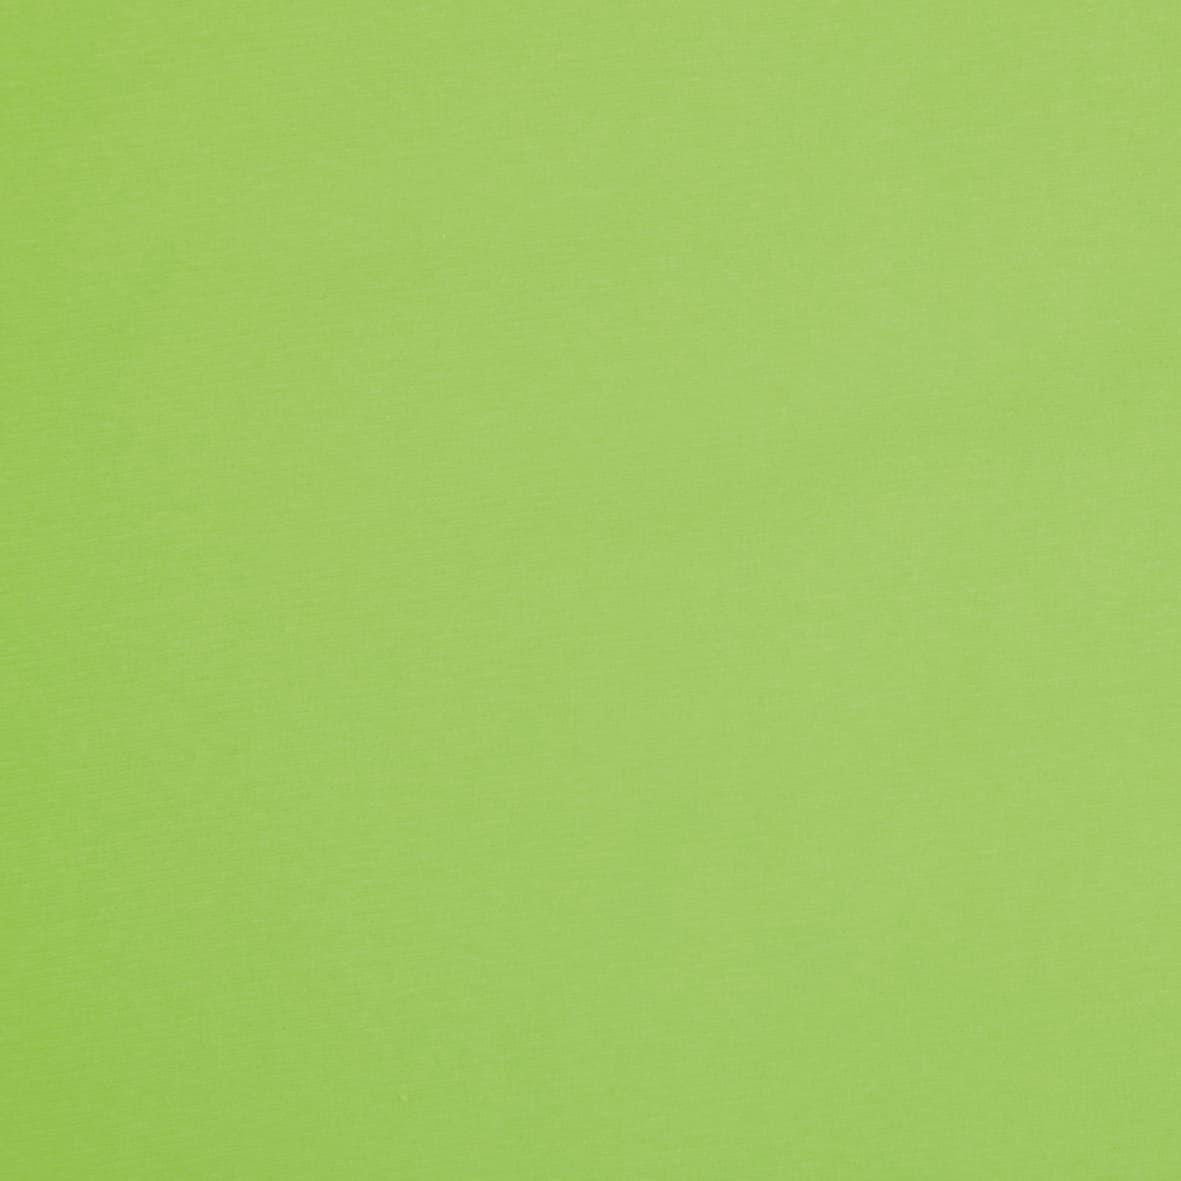 Tafelstoff_limegreen-1